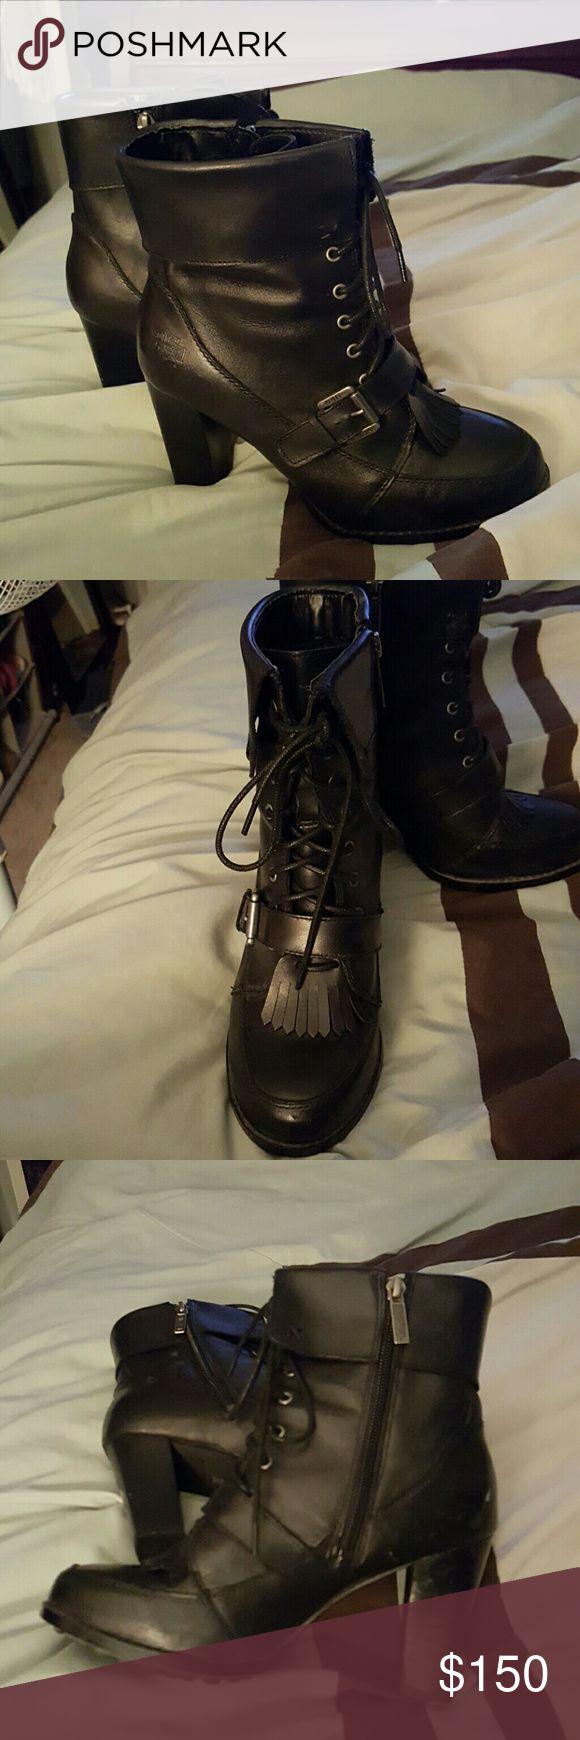 Womens harley boots Brand new harley Davidson boots Harley-Davidson Shoes Heeled Boots